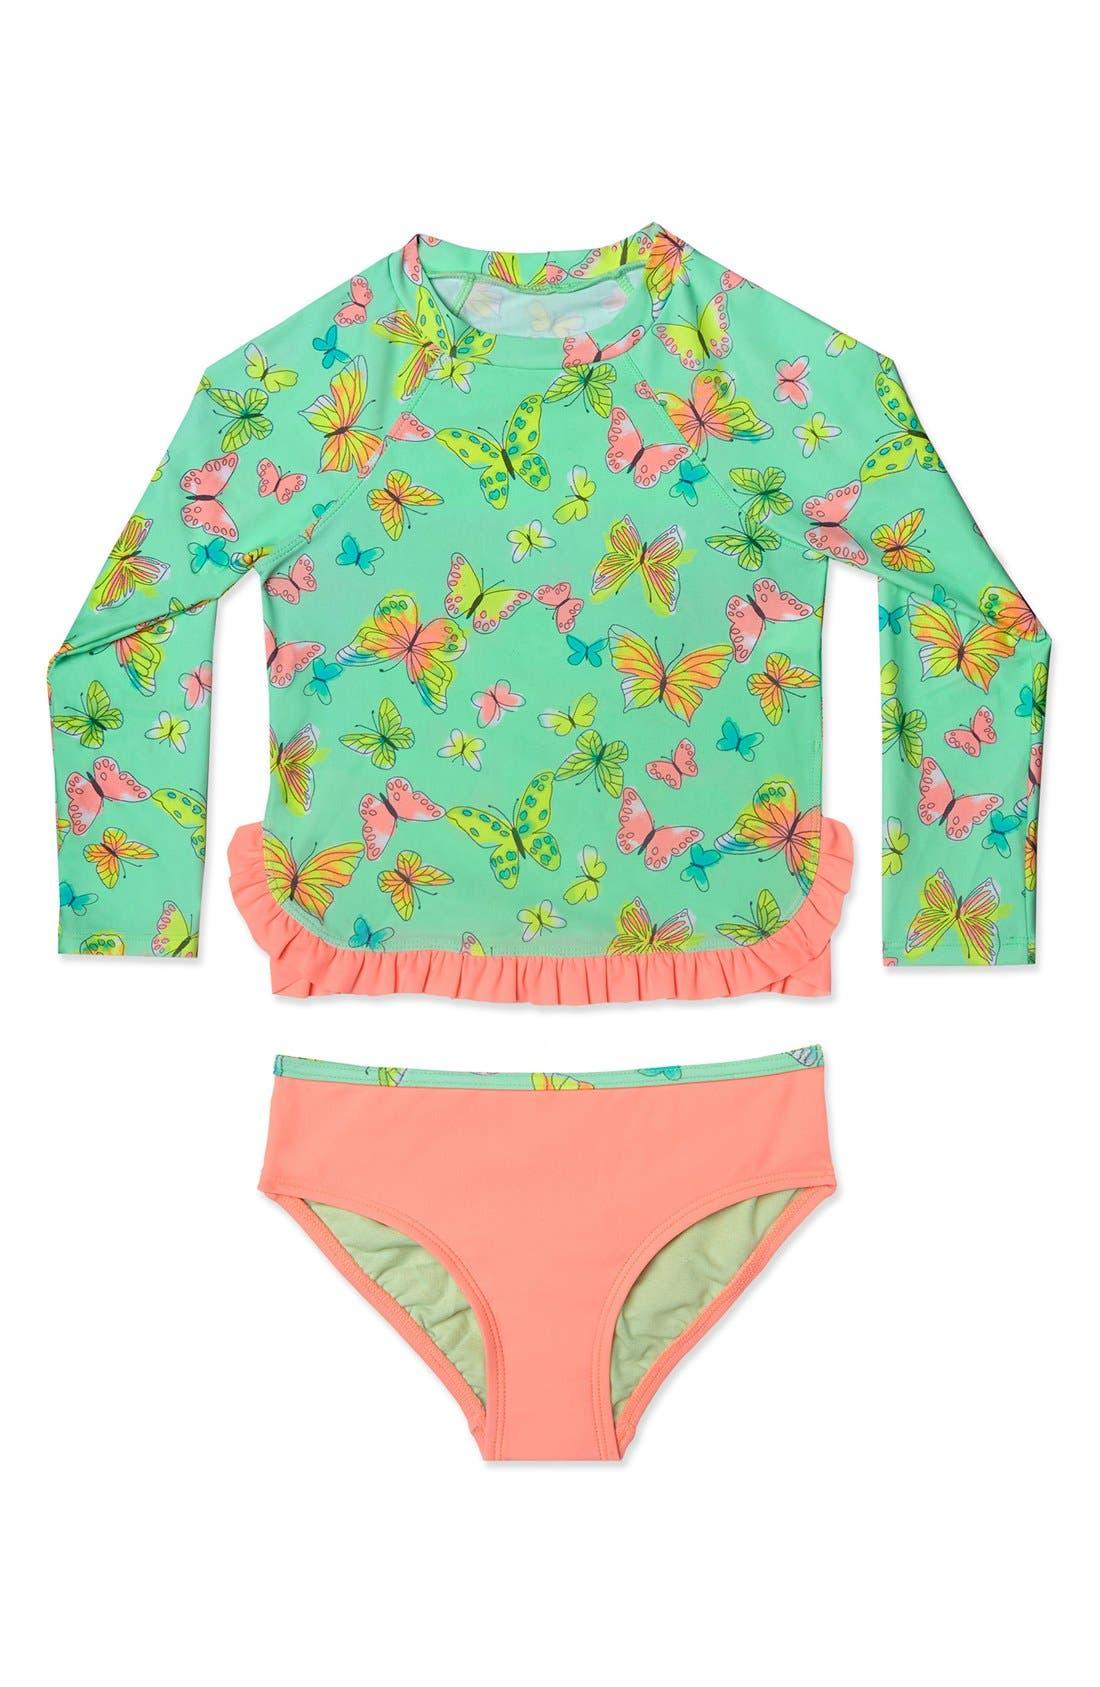 HULA STAR Butterfly Two-Piece Rashguard Swimsuit